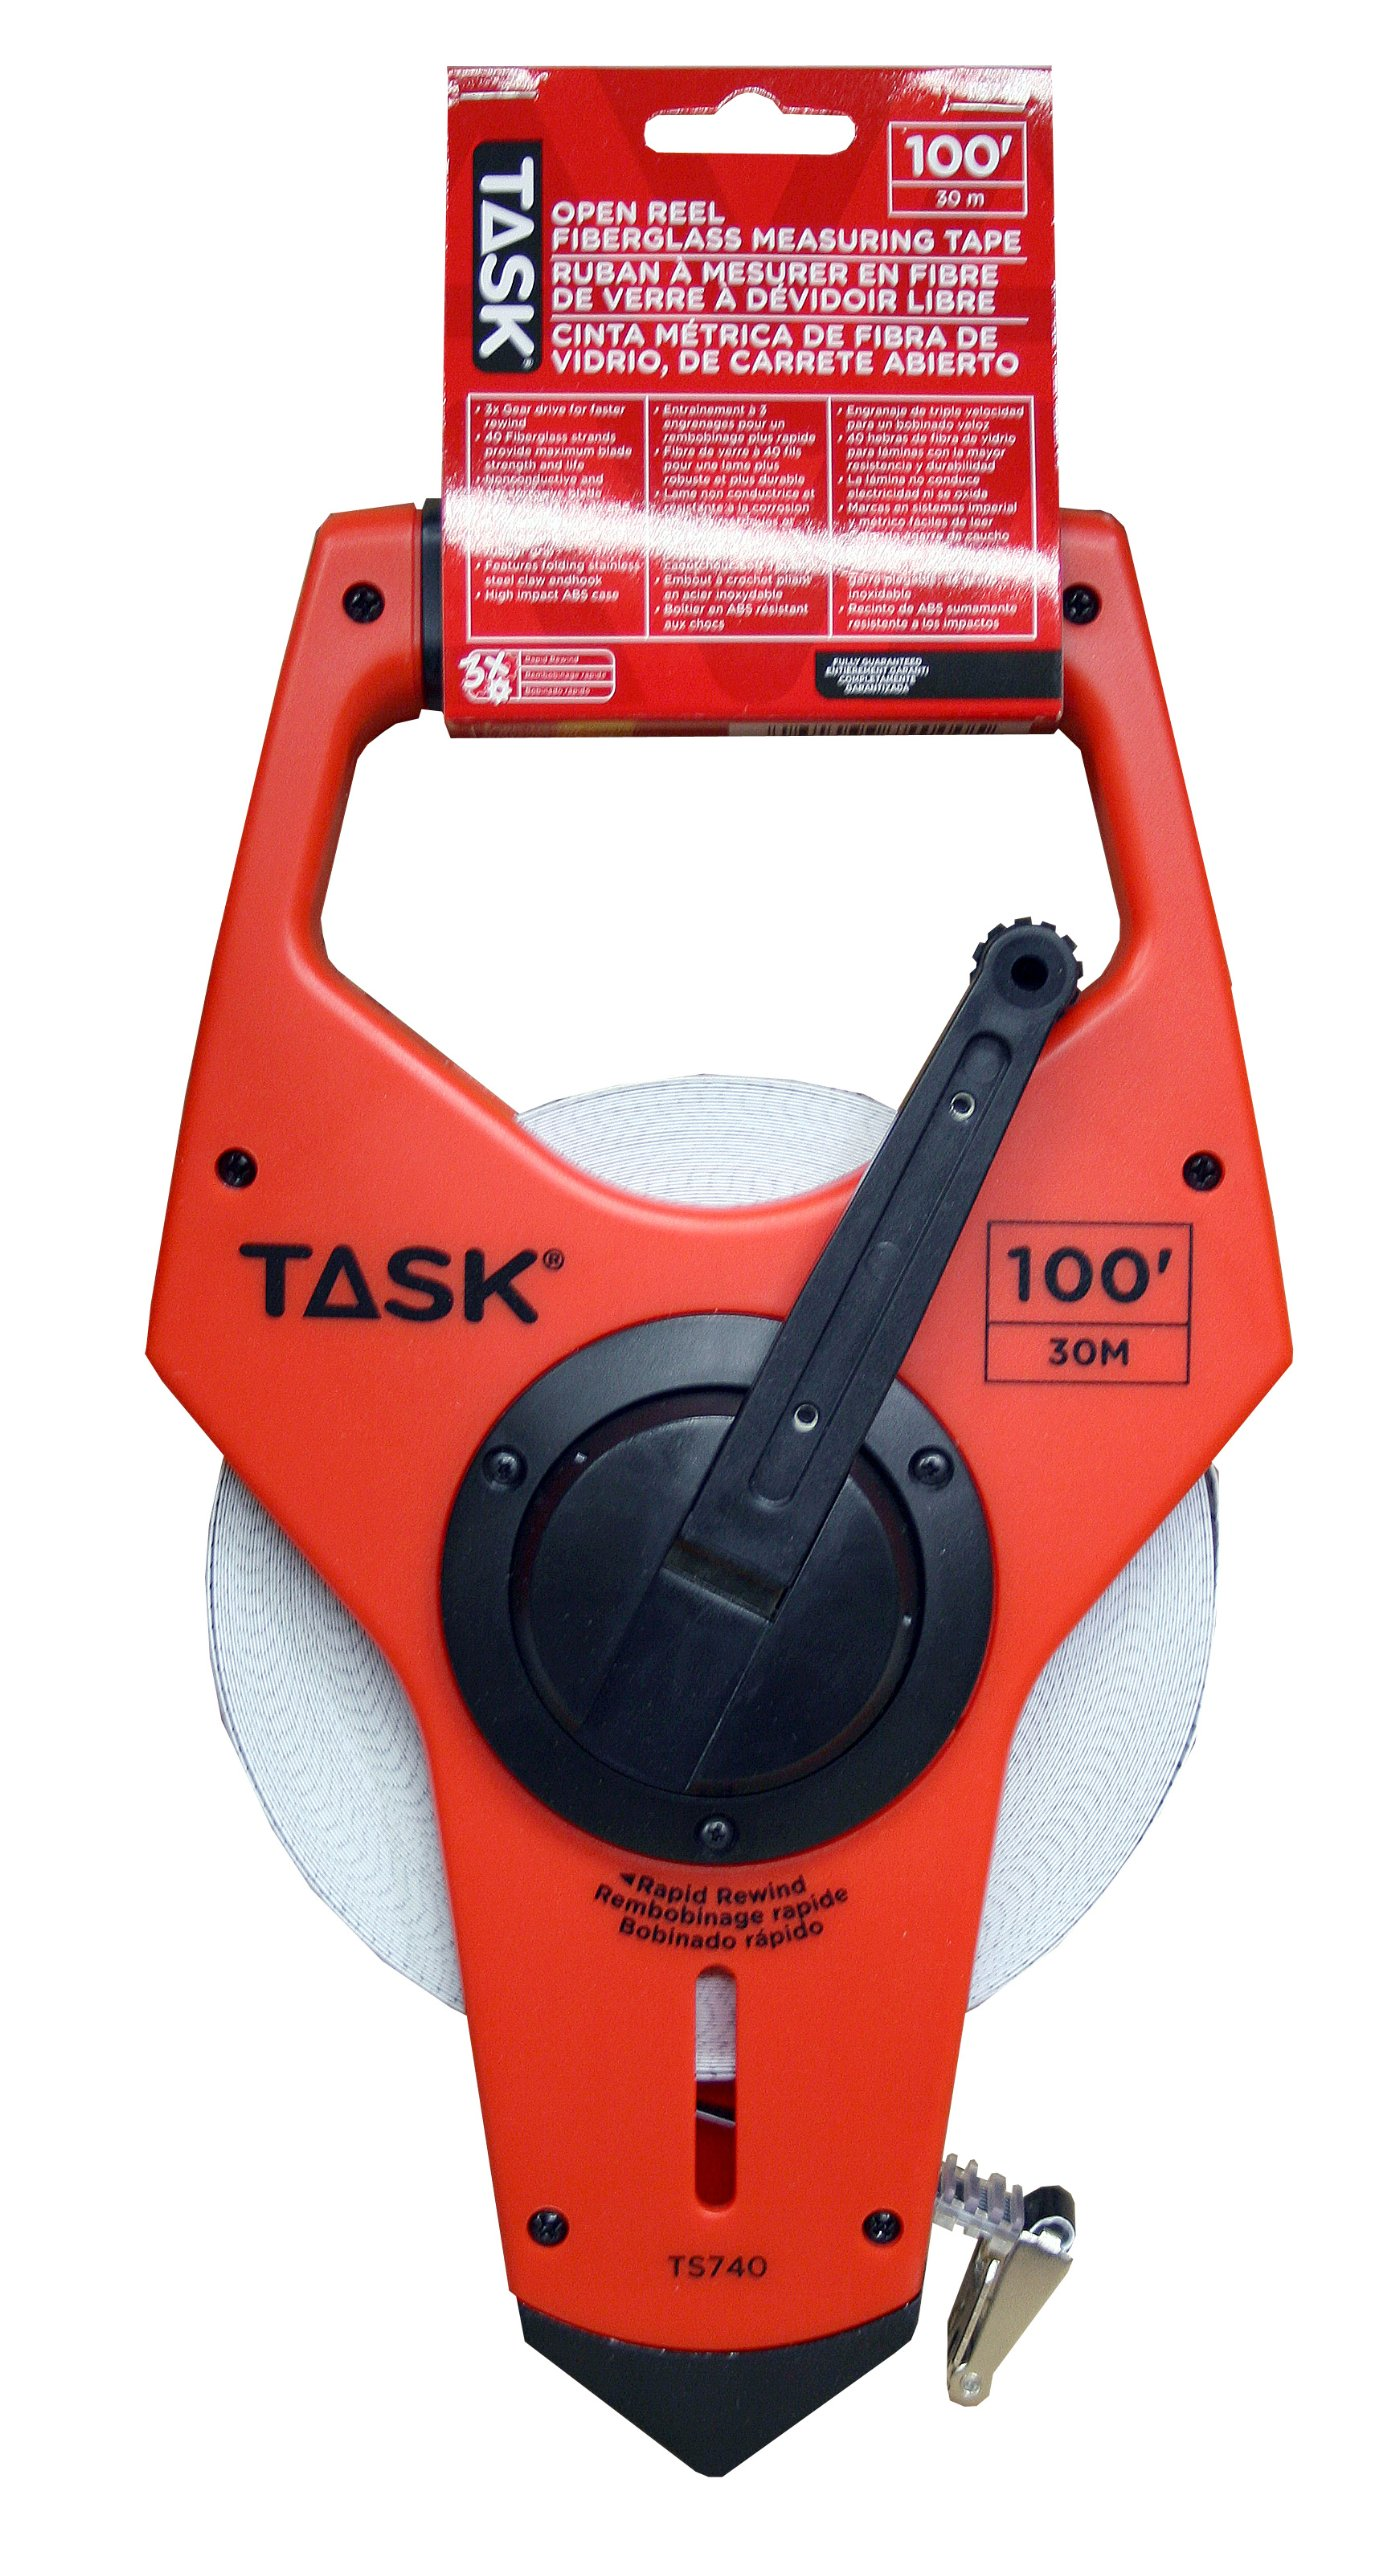 Task Tools TS740 100-Feet Open Reel Fiberglass Tape Measure with 3X Gear Drive